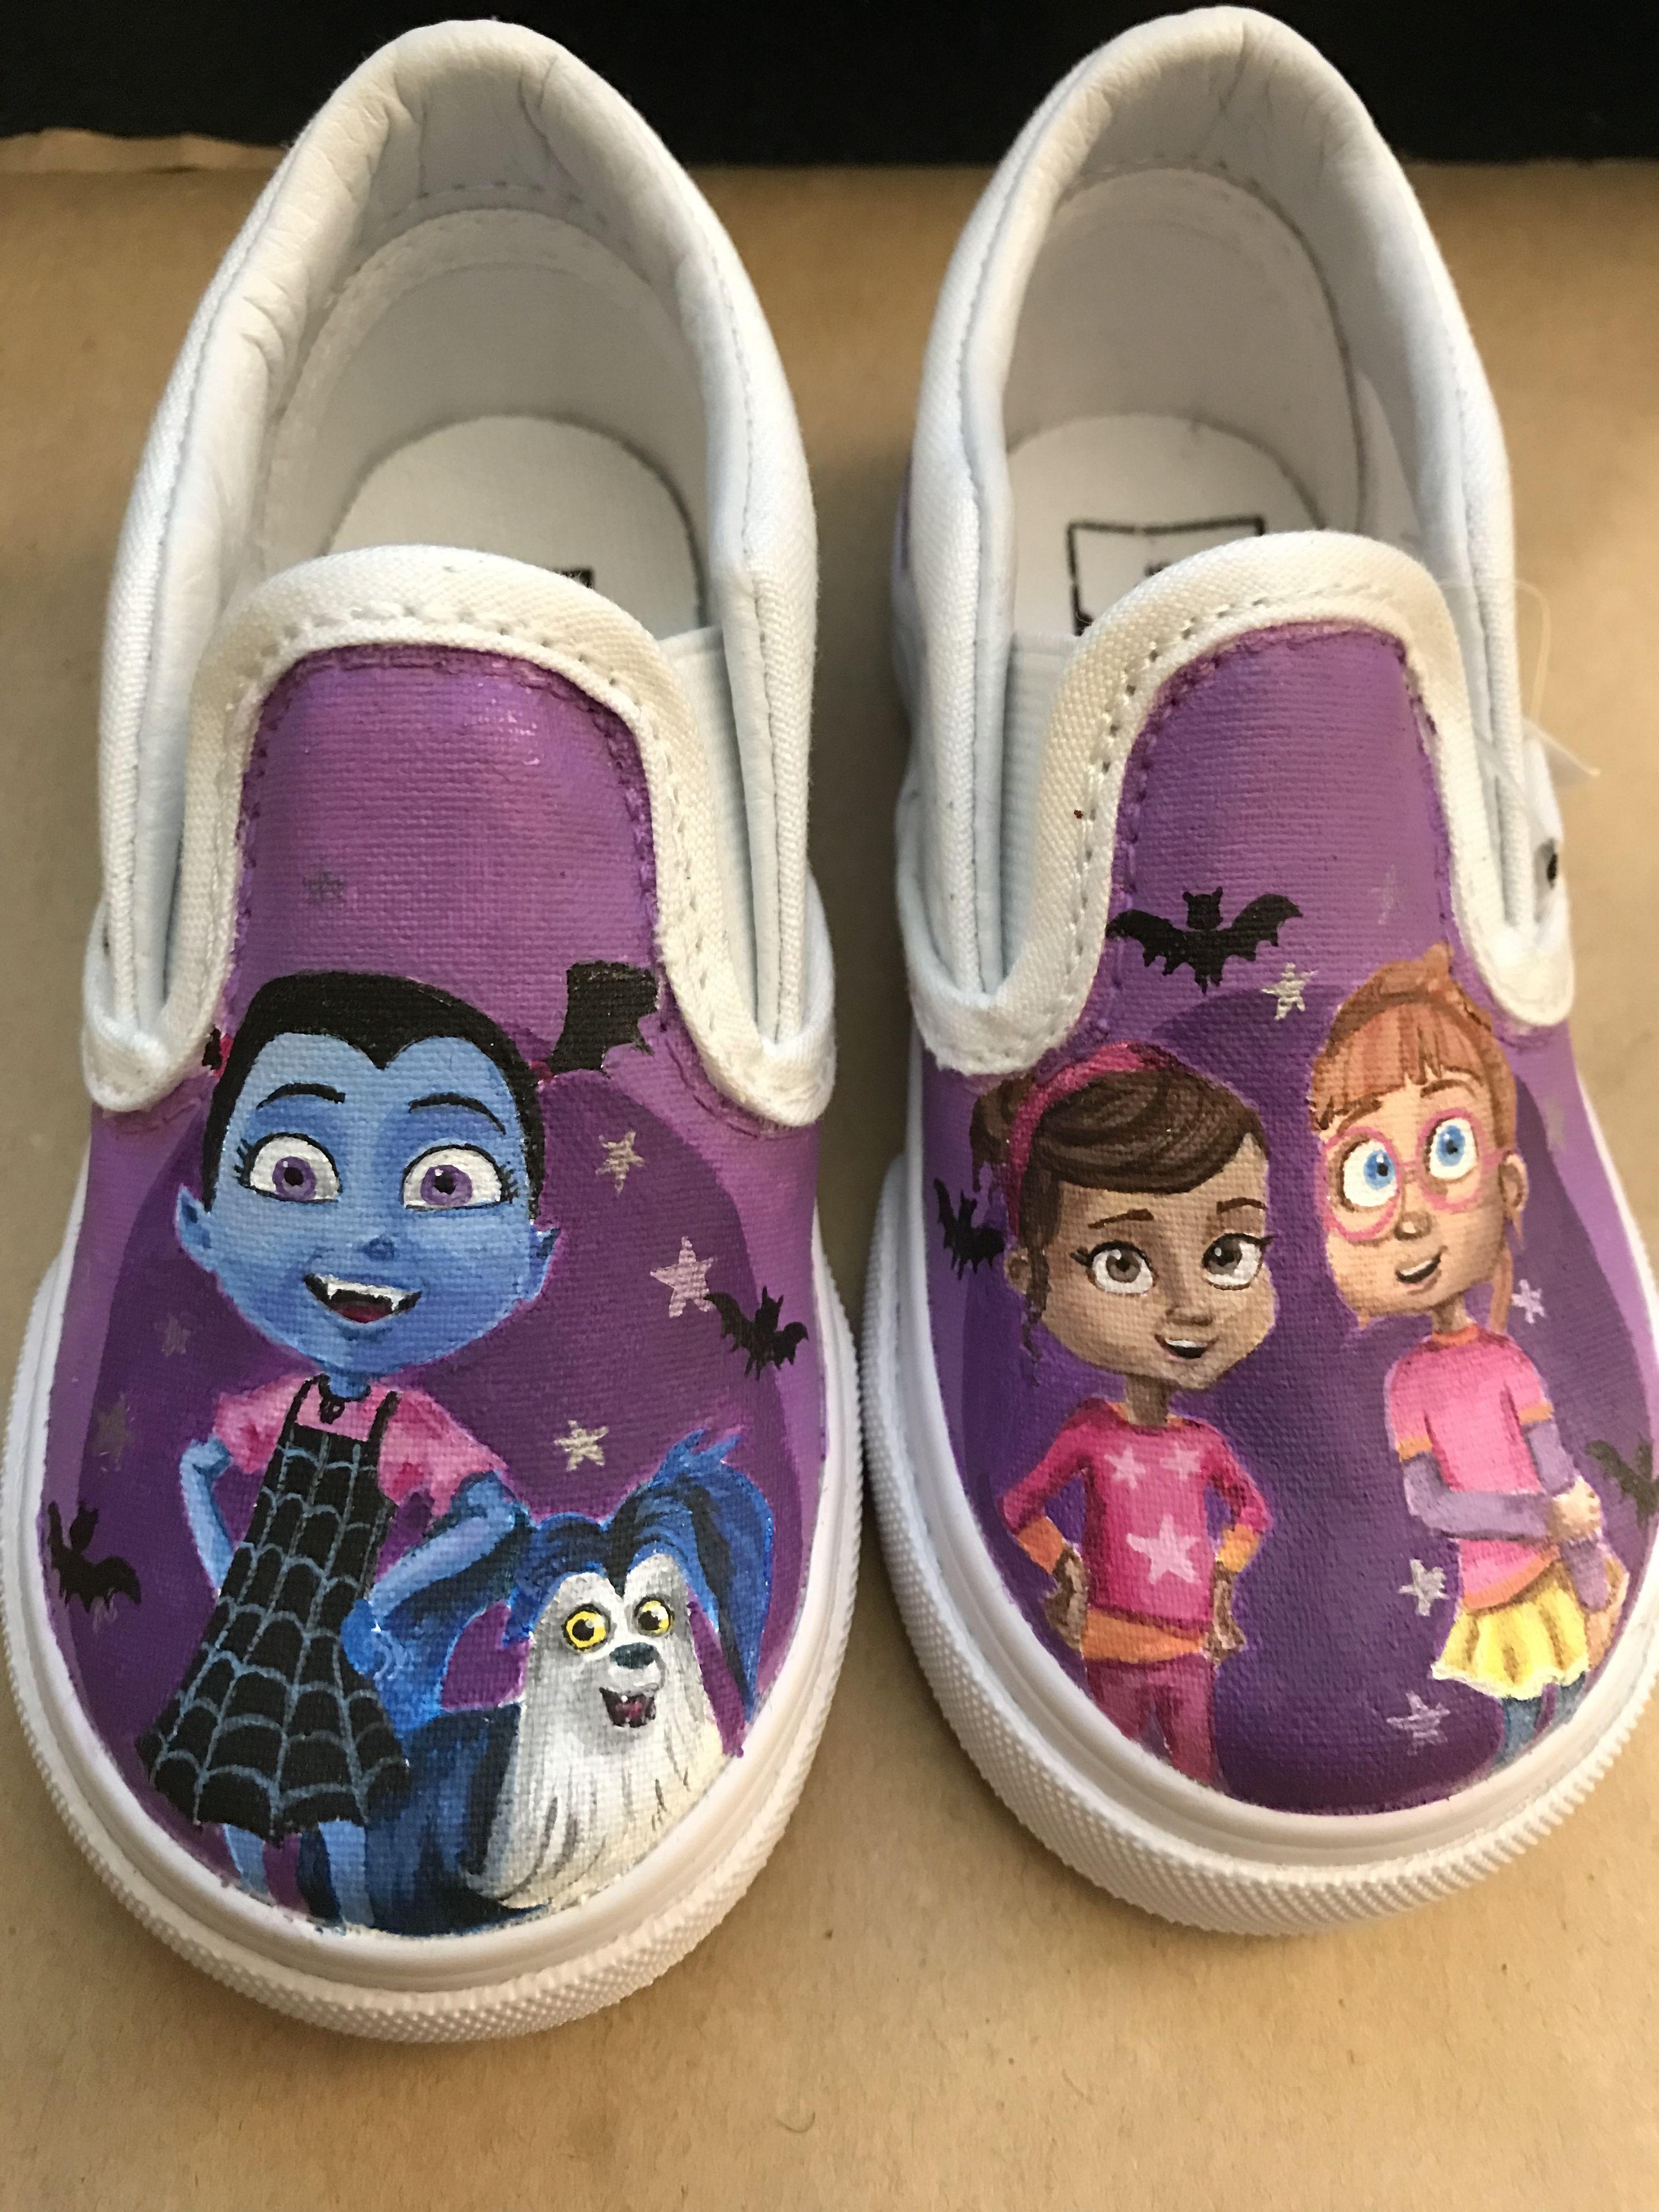 d5e014455b78 Custom Disney Vampirina vans! Toddler shoes hand painted for a repeat  customer!